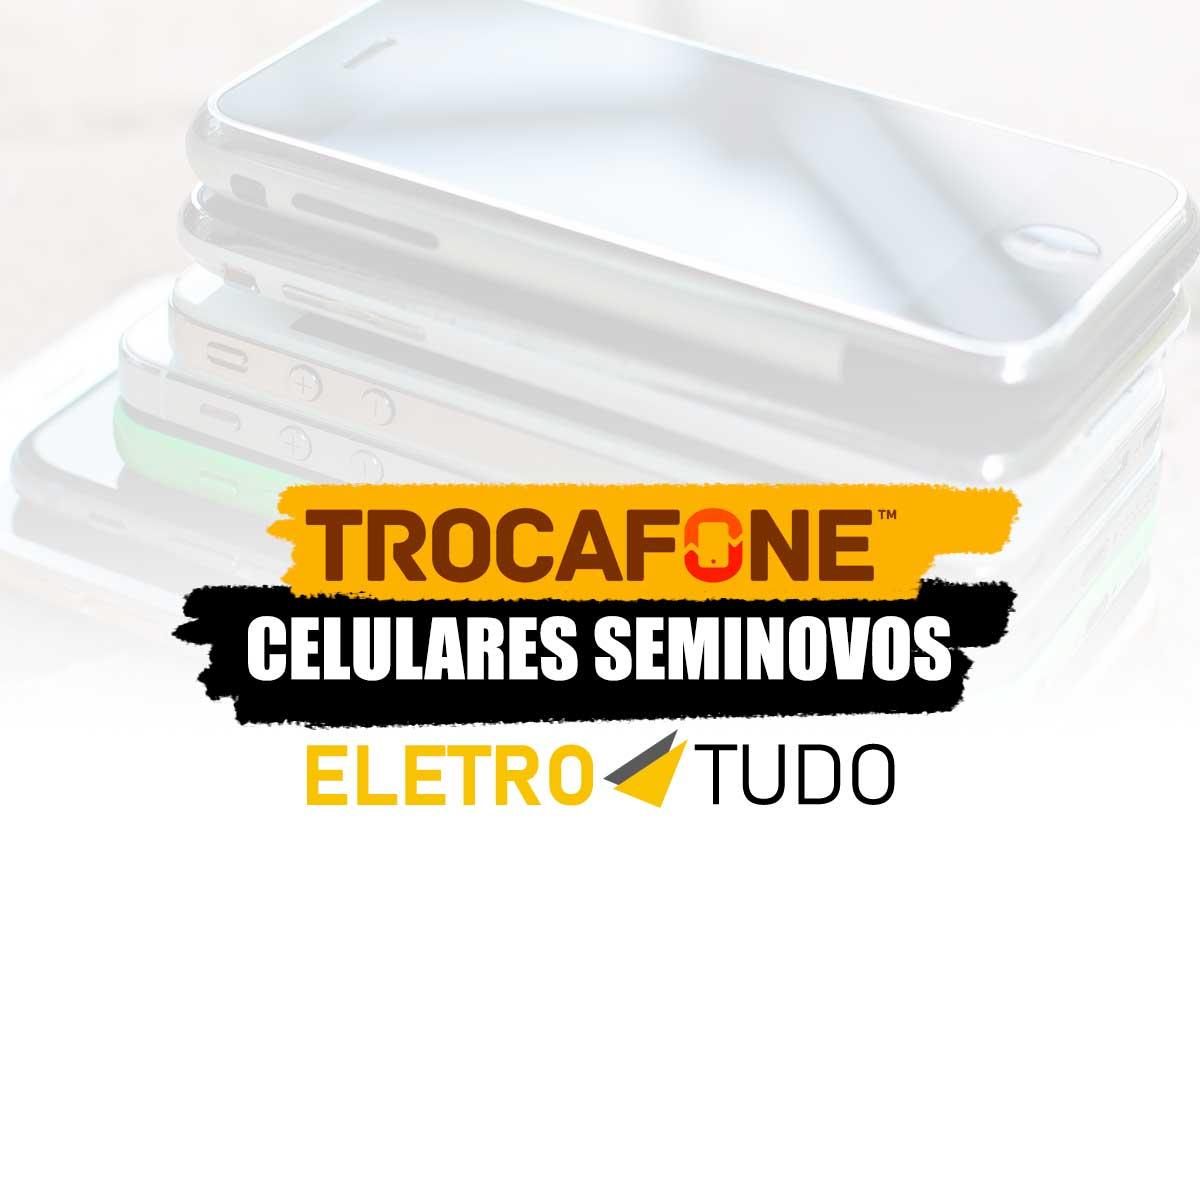 troca fone iphones seminovos